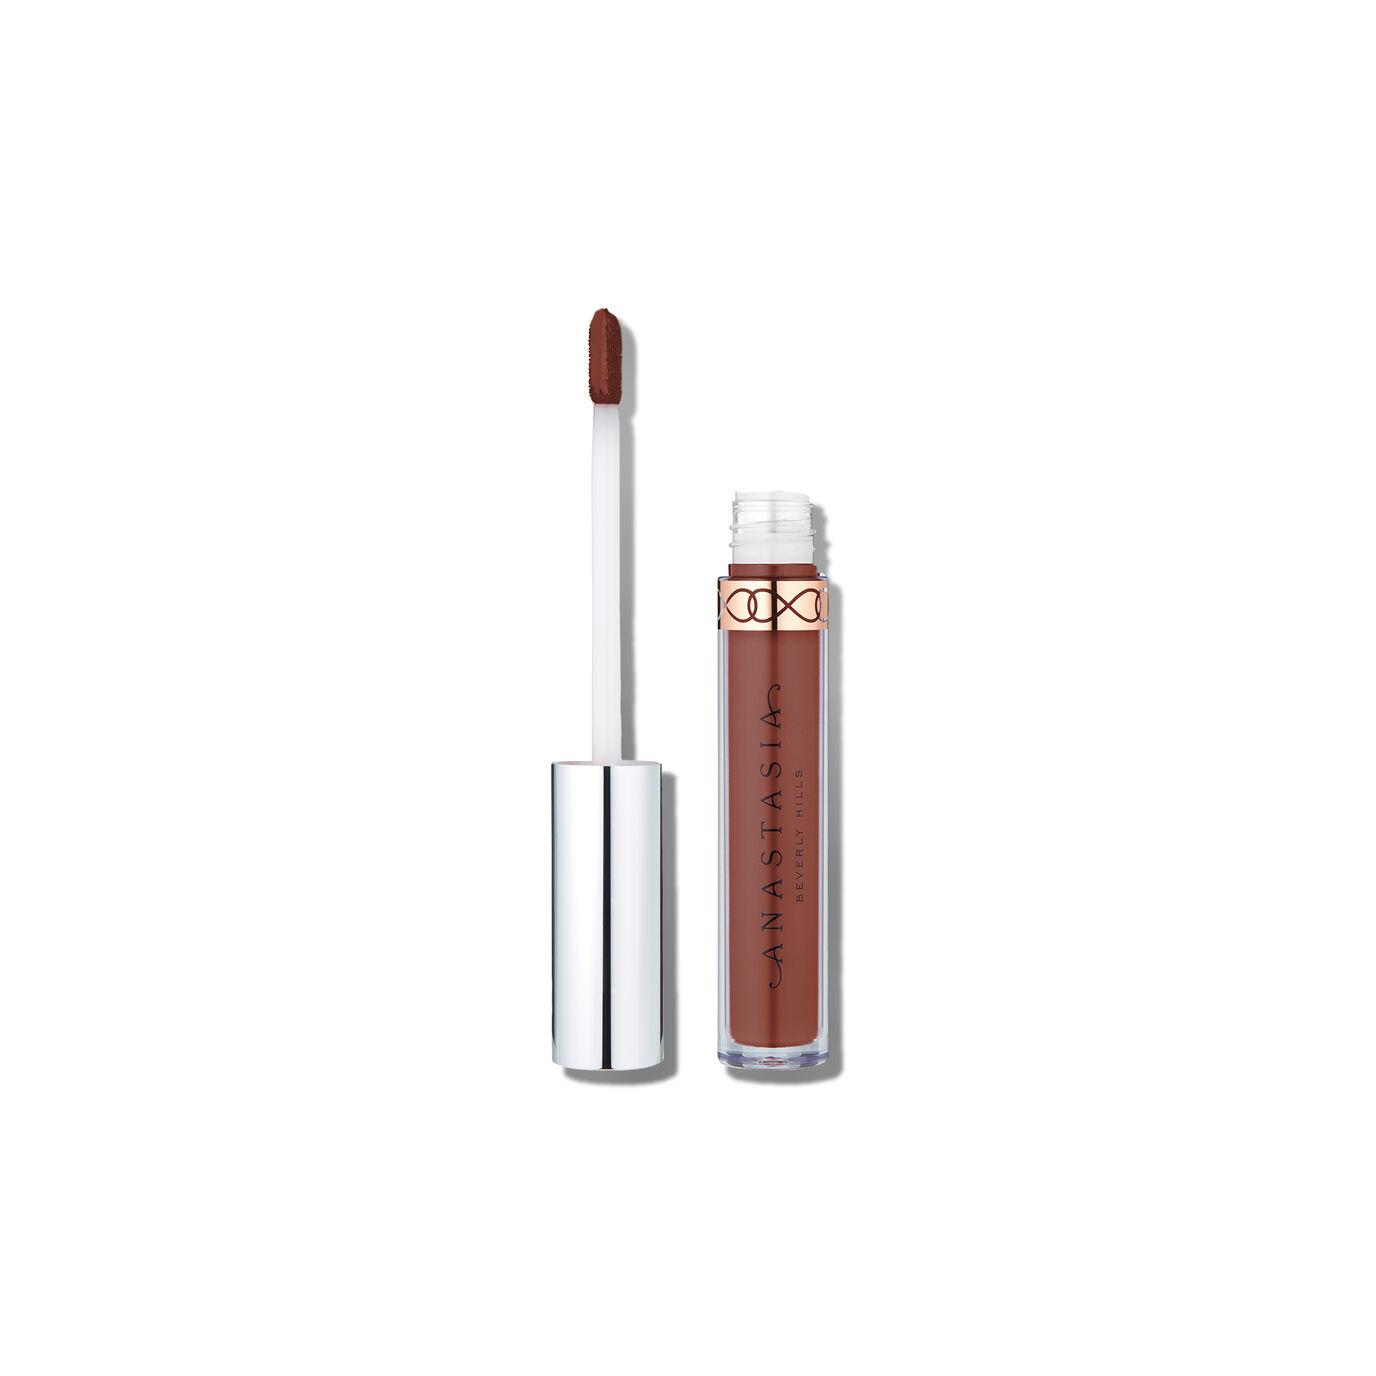 Liquid Lipstick - Maude